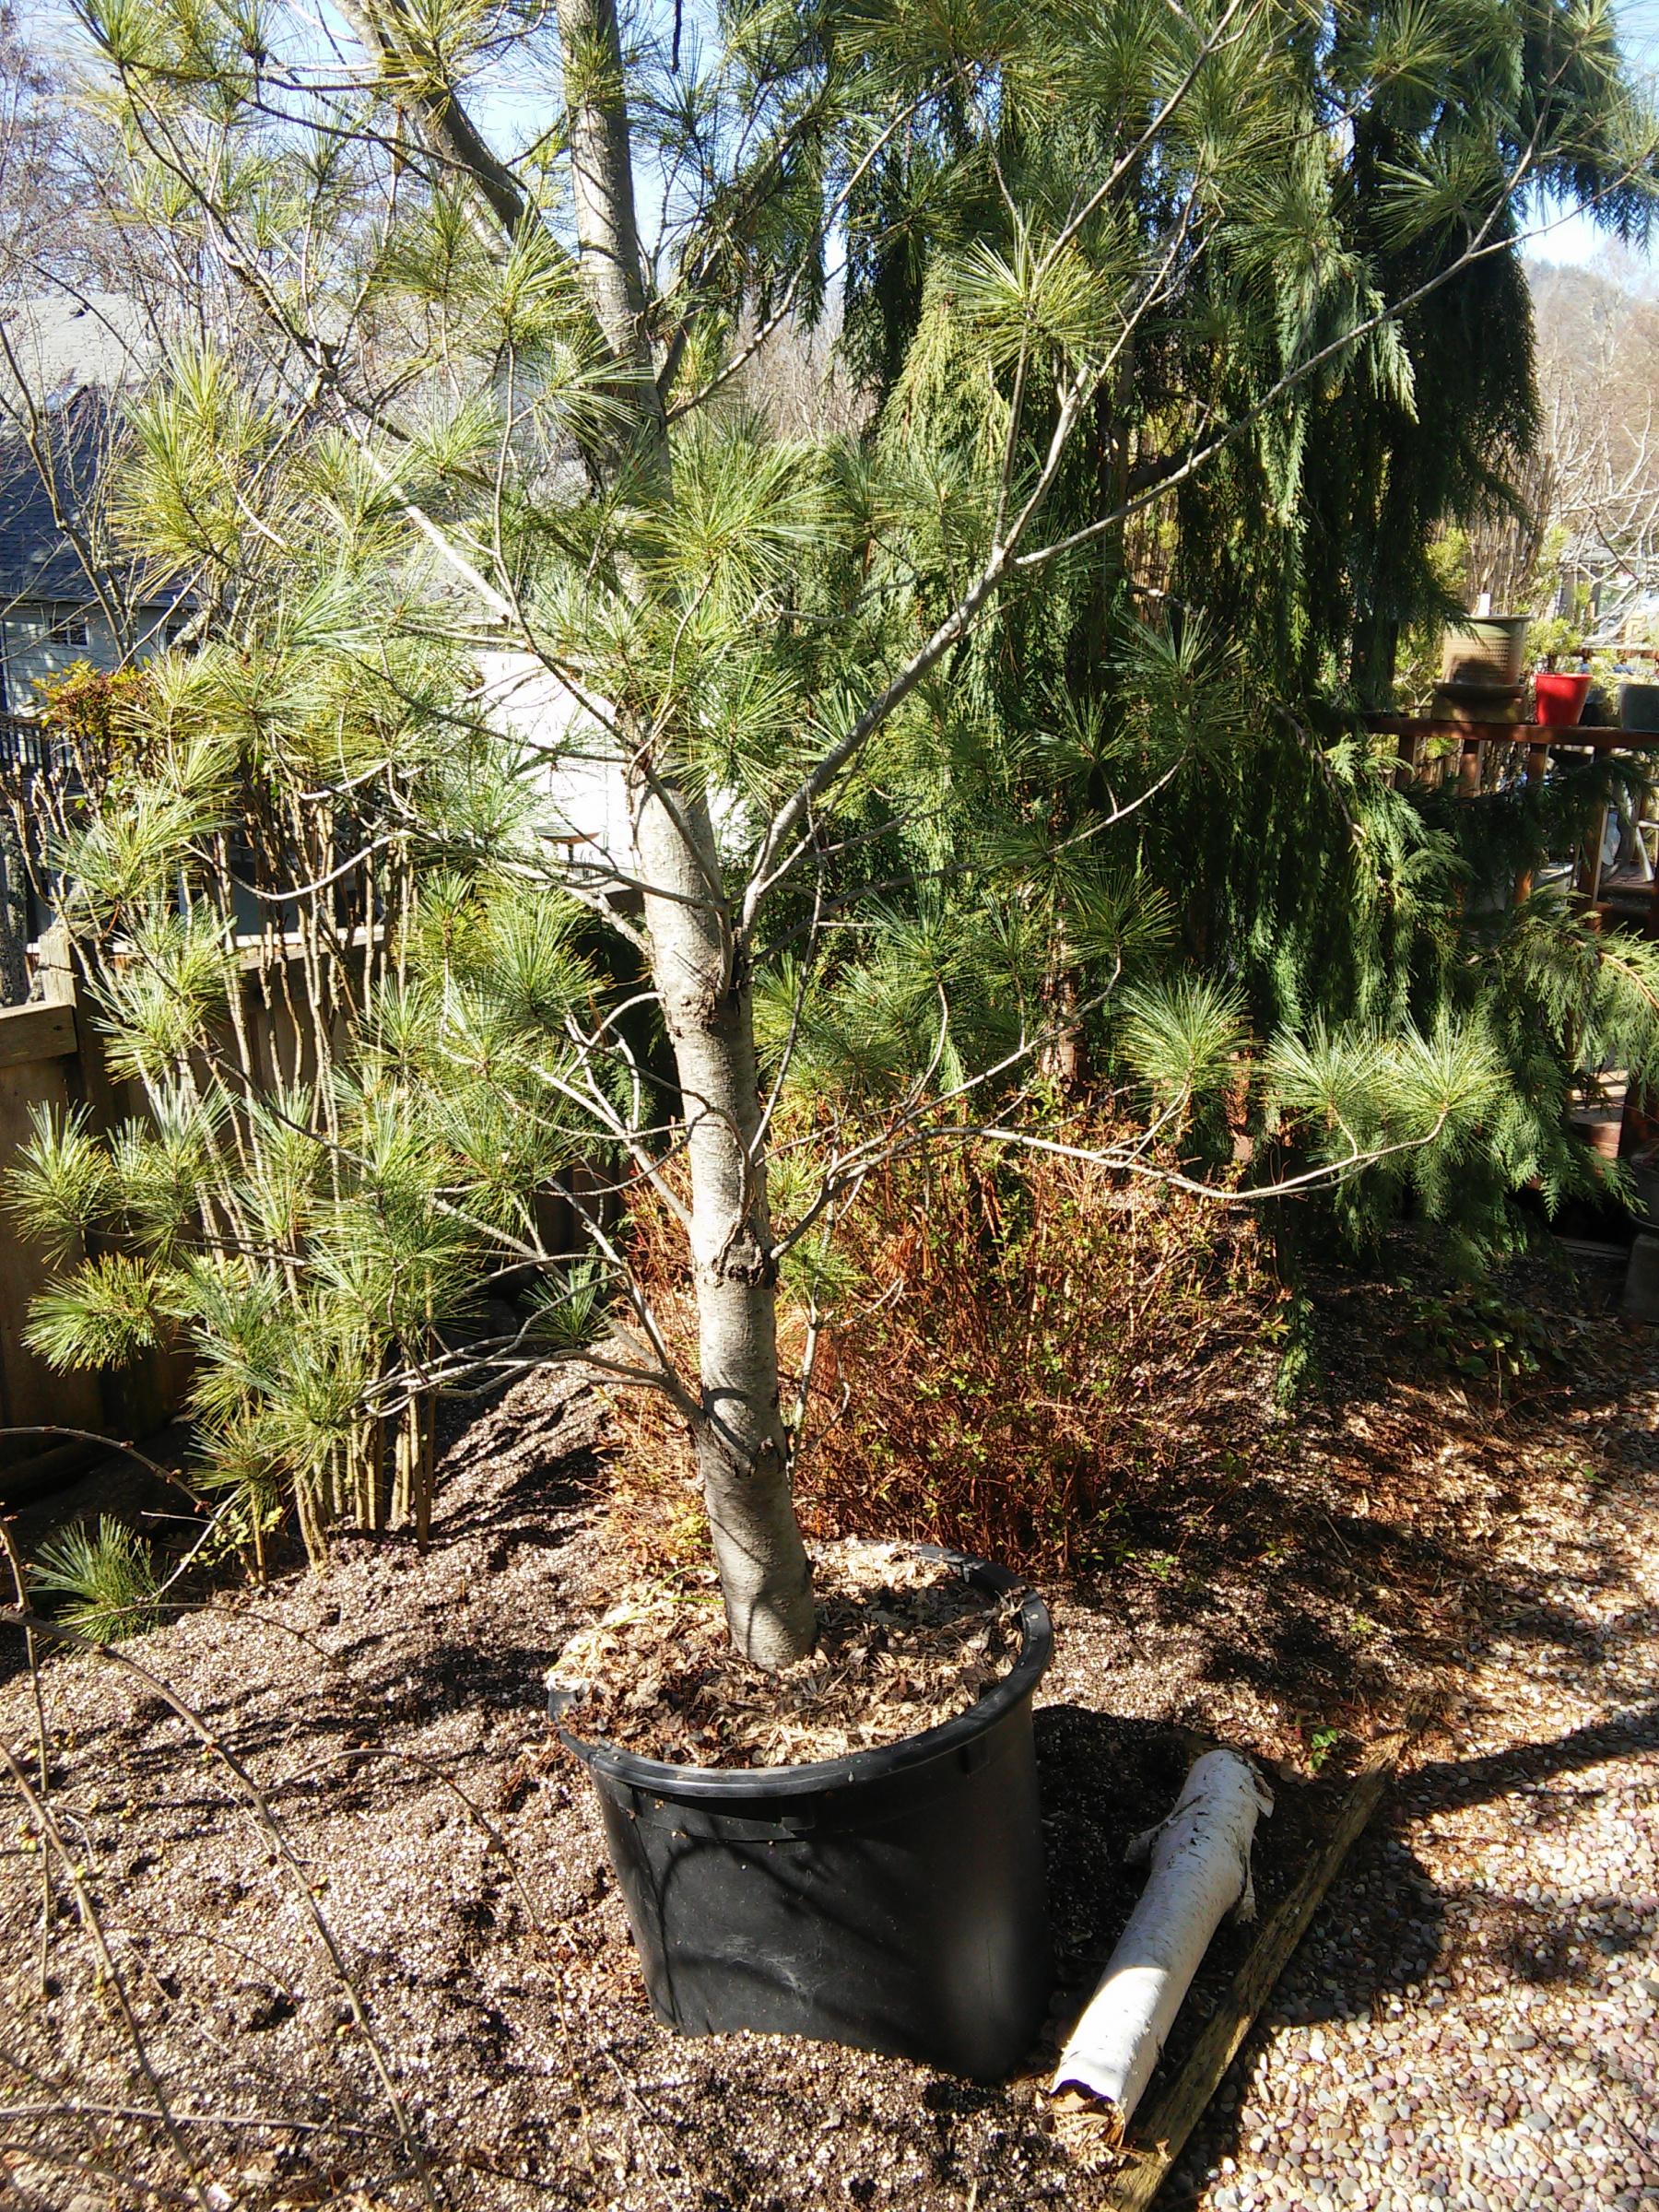 Pine Tree ID Request-pine1.jpg